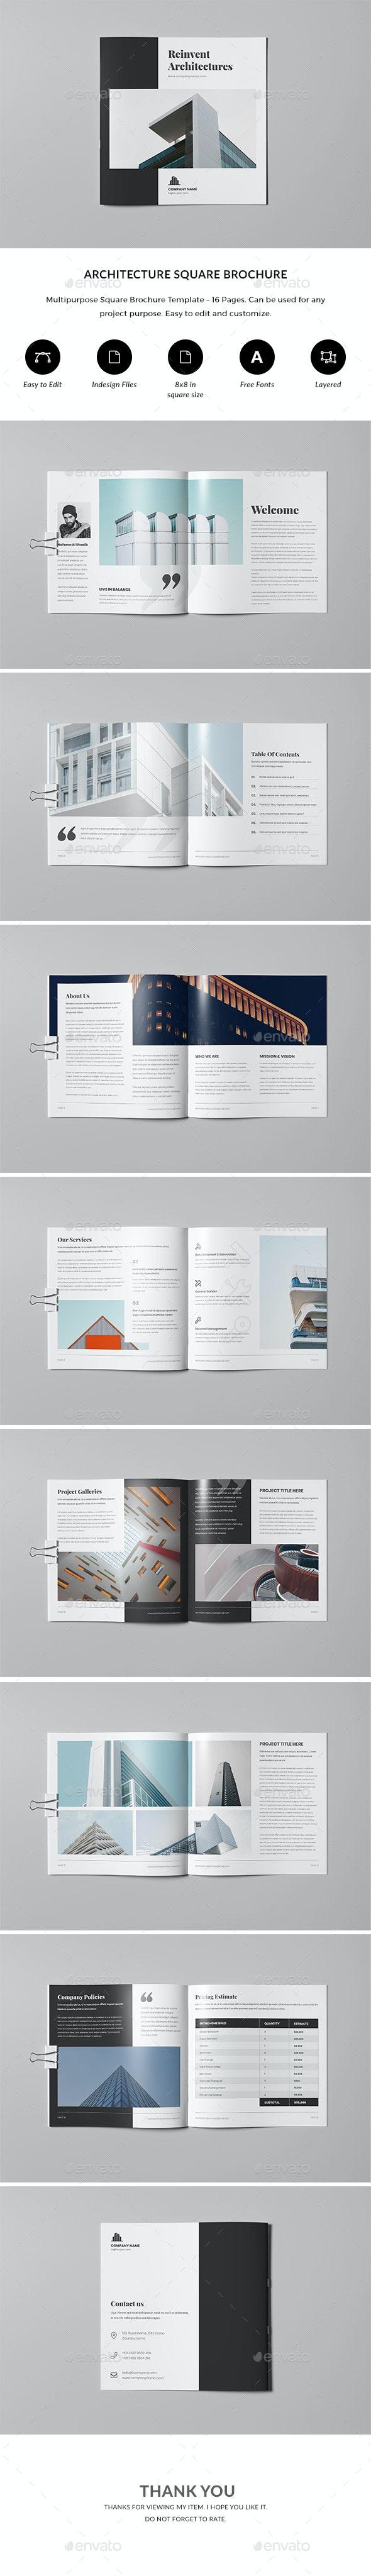 Architecture / Multipurpose Brochure Indesign Template - Corporate Brochures